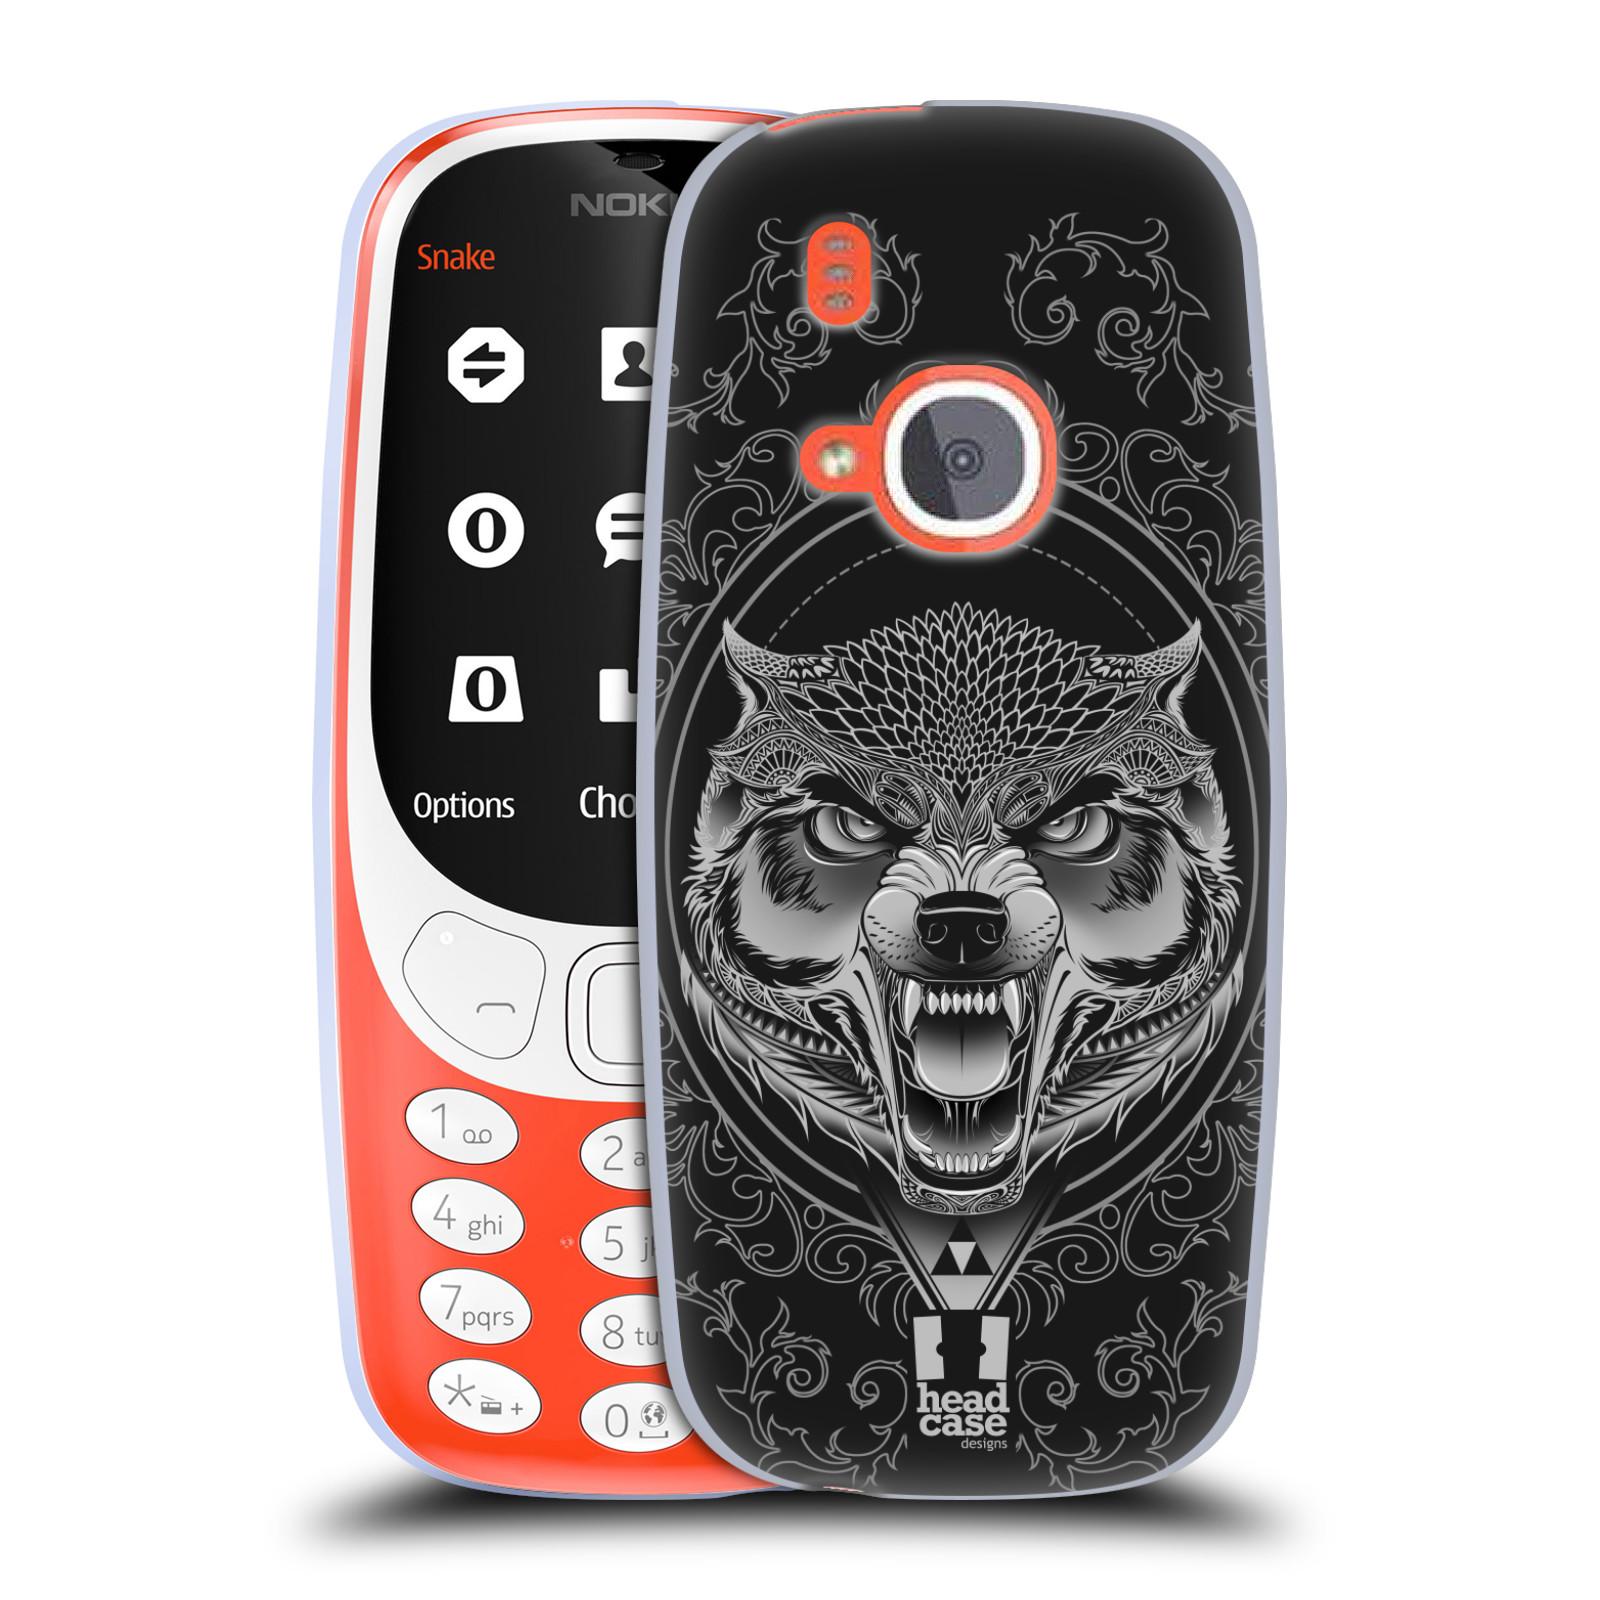 Silikonové pouzdro na mobil Nokia 3310 - Head Case - Krutý vlk (Silikonový kryt či obal na mobilní telefon Nokia 3310 (2017) s motivem Krutý vlk)